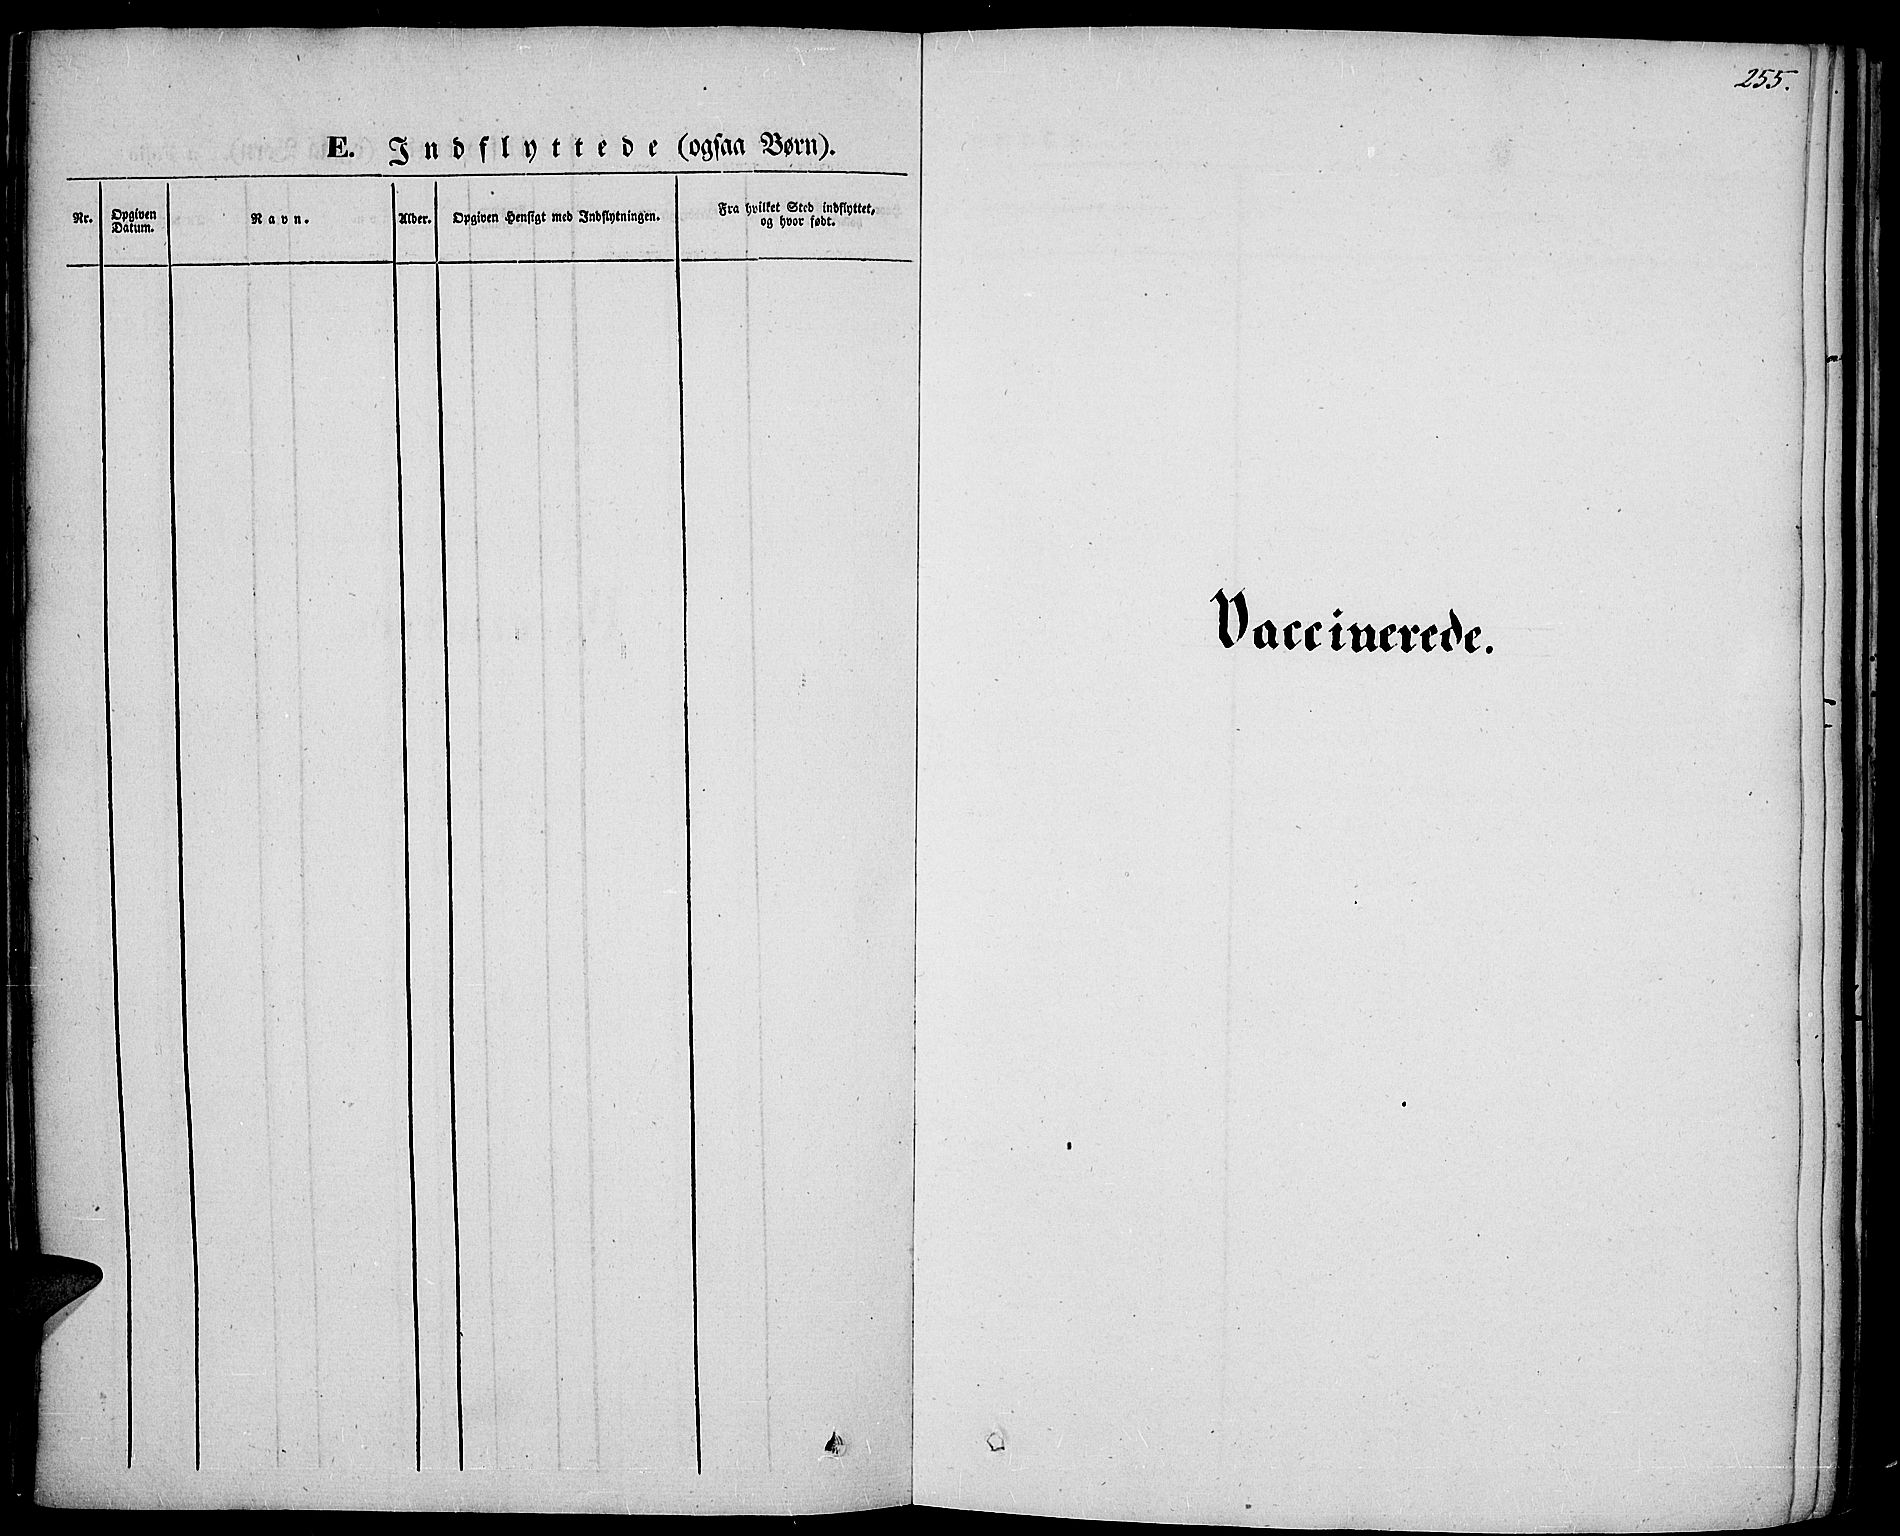 SAH, Vestre Toten prestekontor, H/Ha/Haa/L0004: Ministerialbok nr. 4, 1844-1849, s. 255